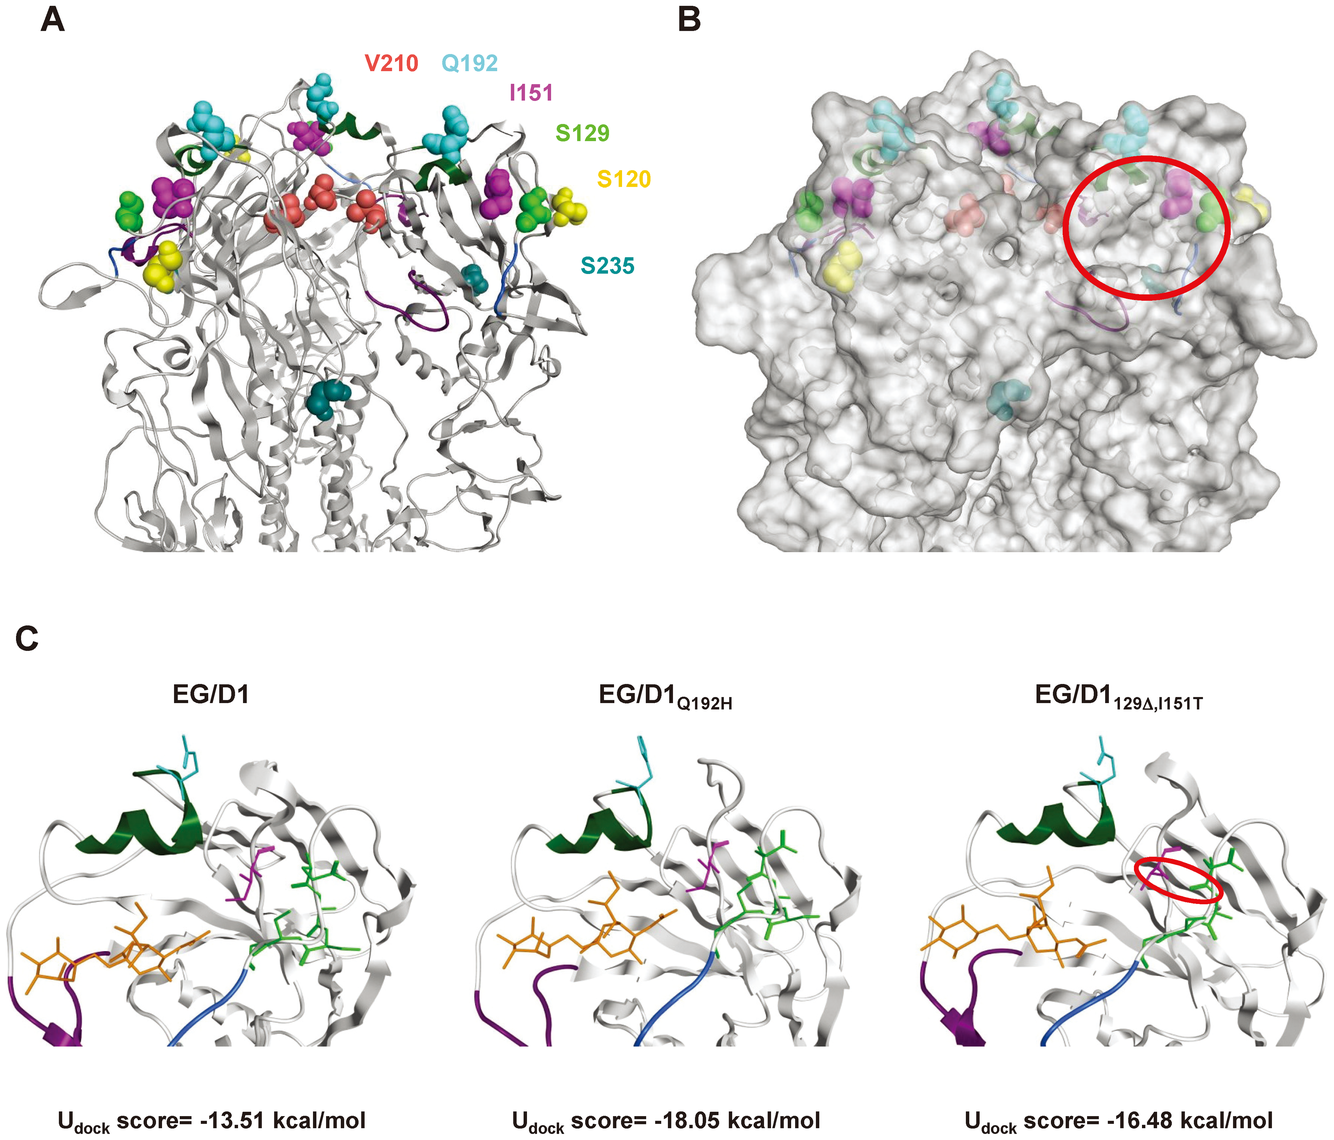 Analysis of receptor docking modes of EG/D1 HA and HA mutants.